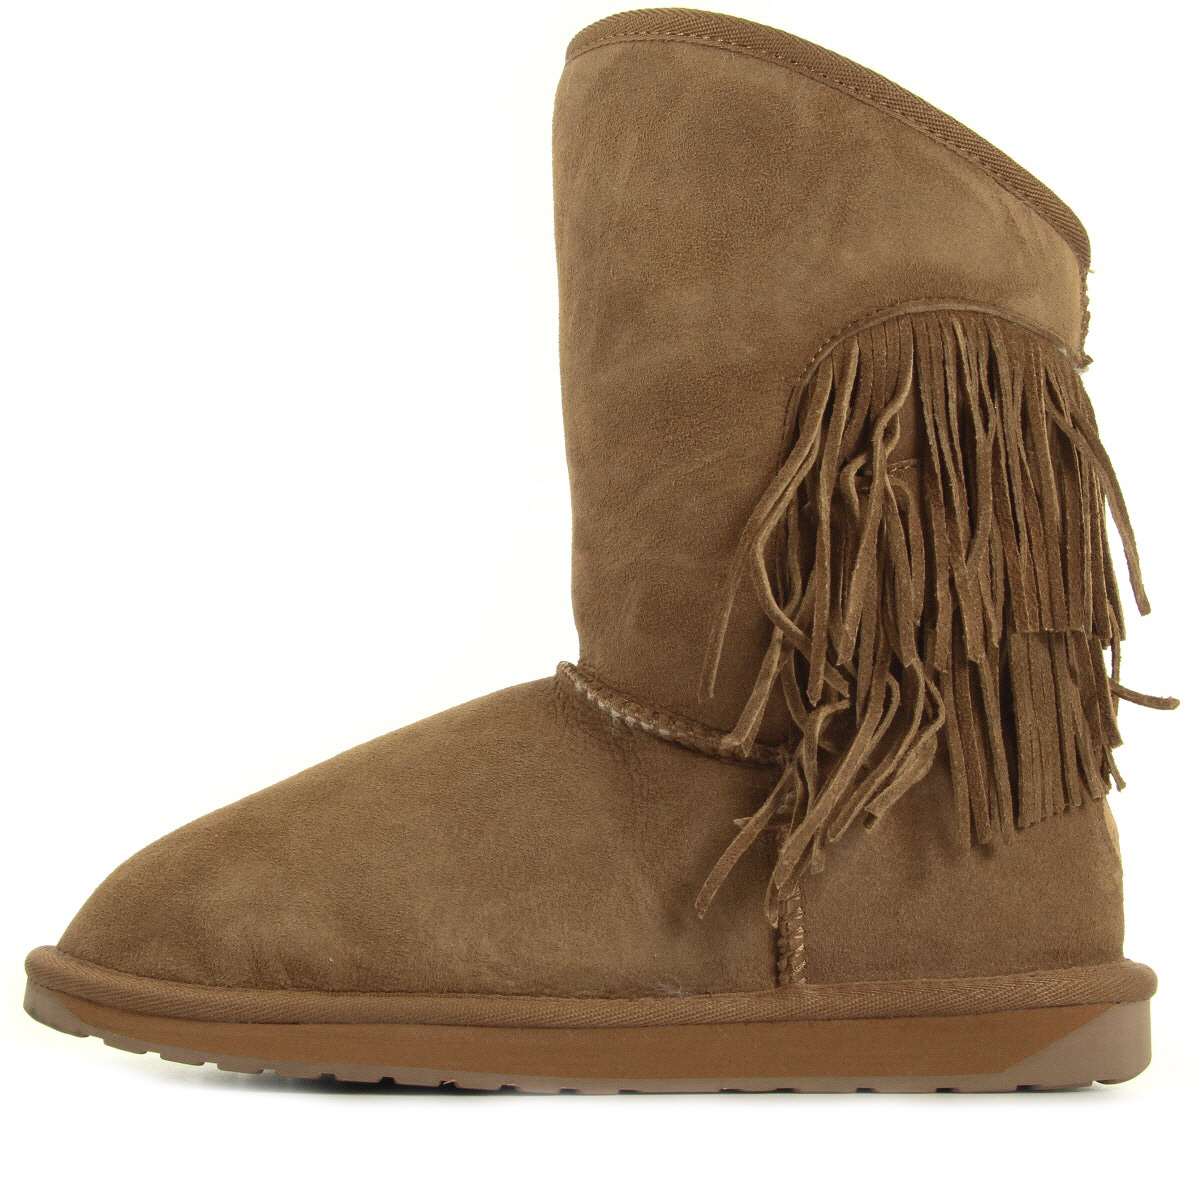 EMU Australia Woodstock Chataigne W11259CHESTNUT, Boots femme